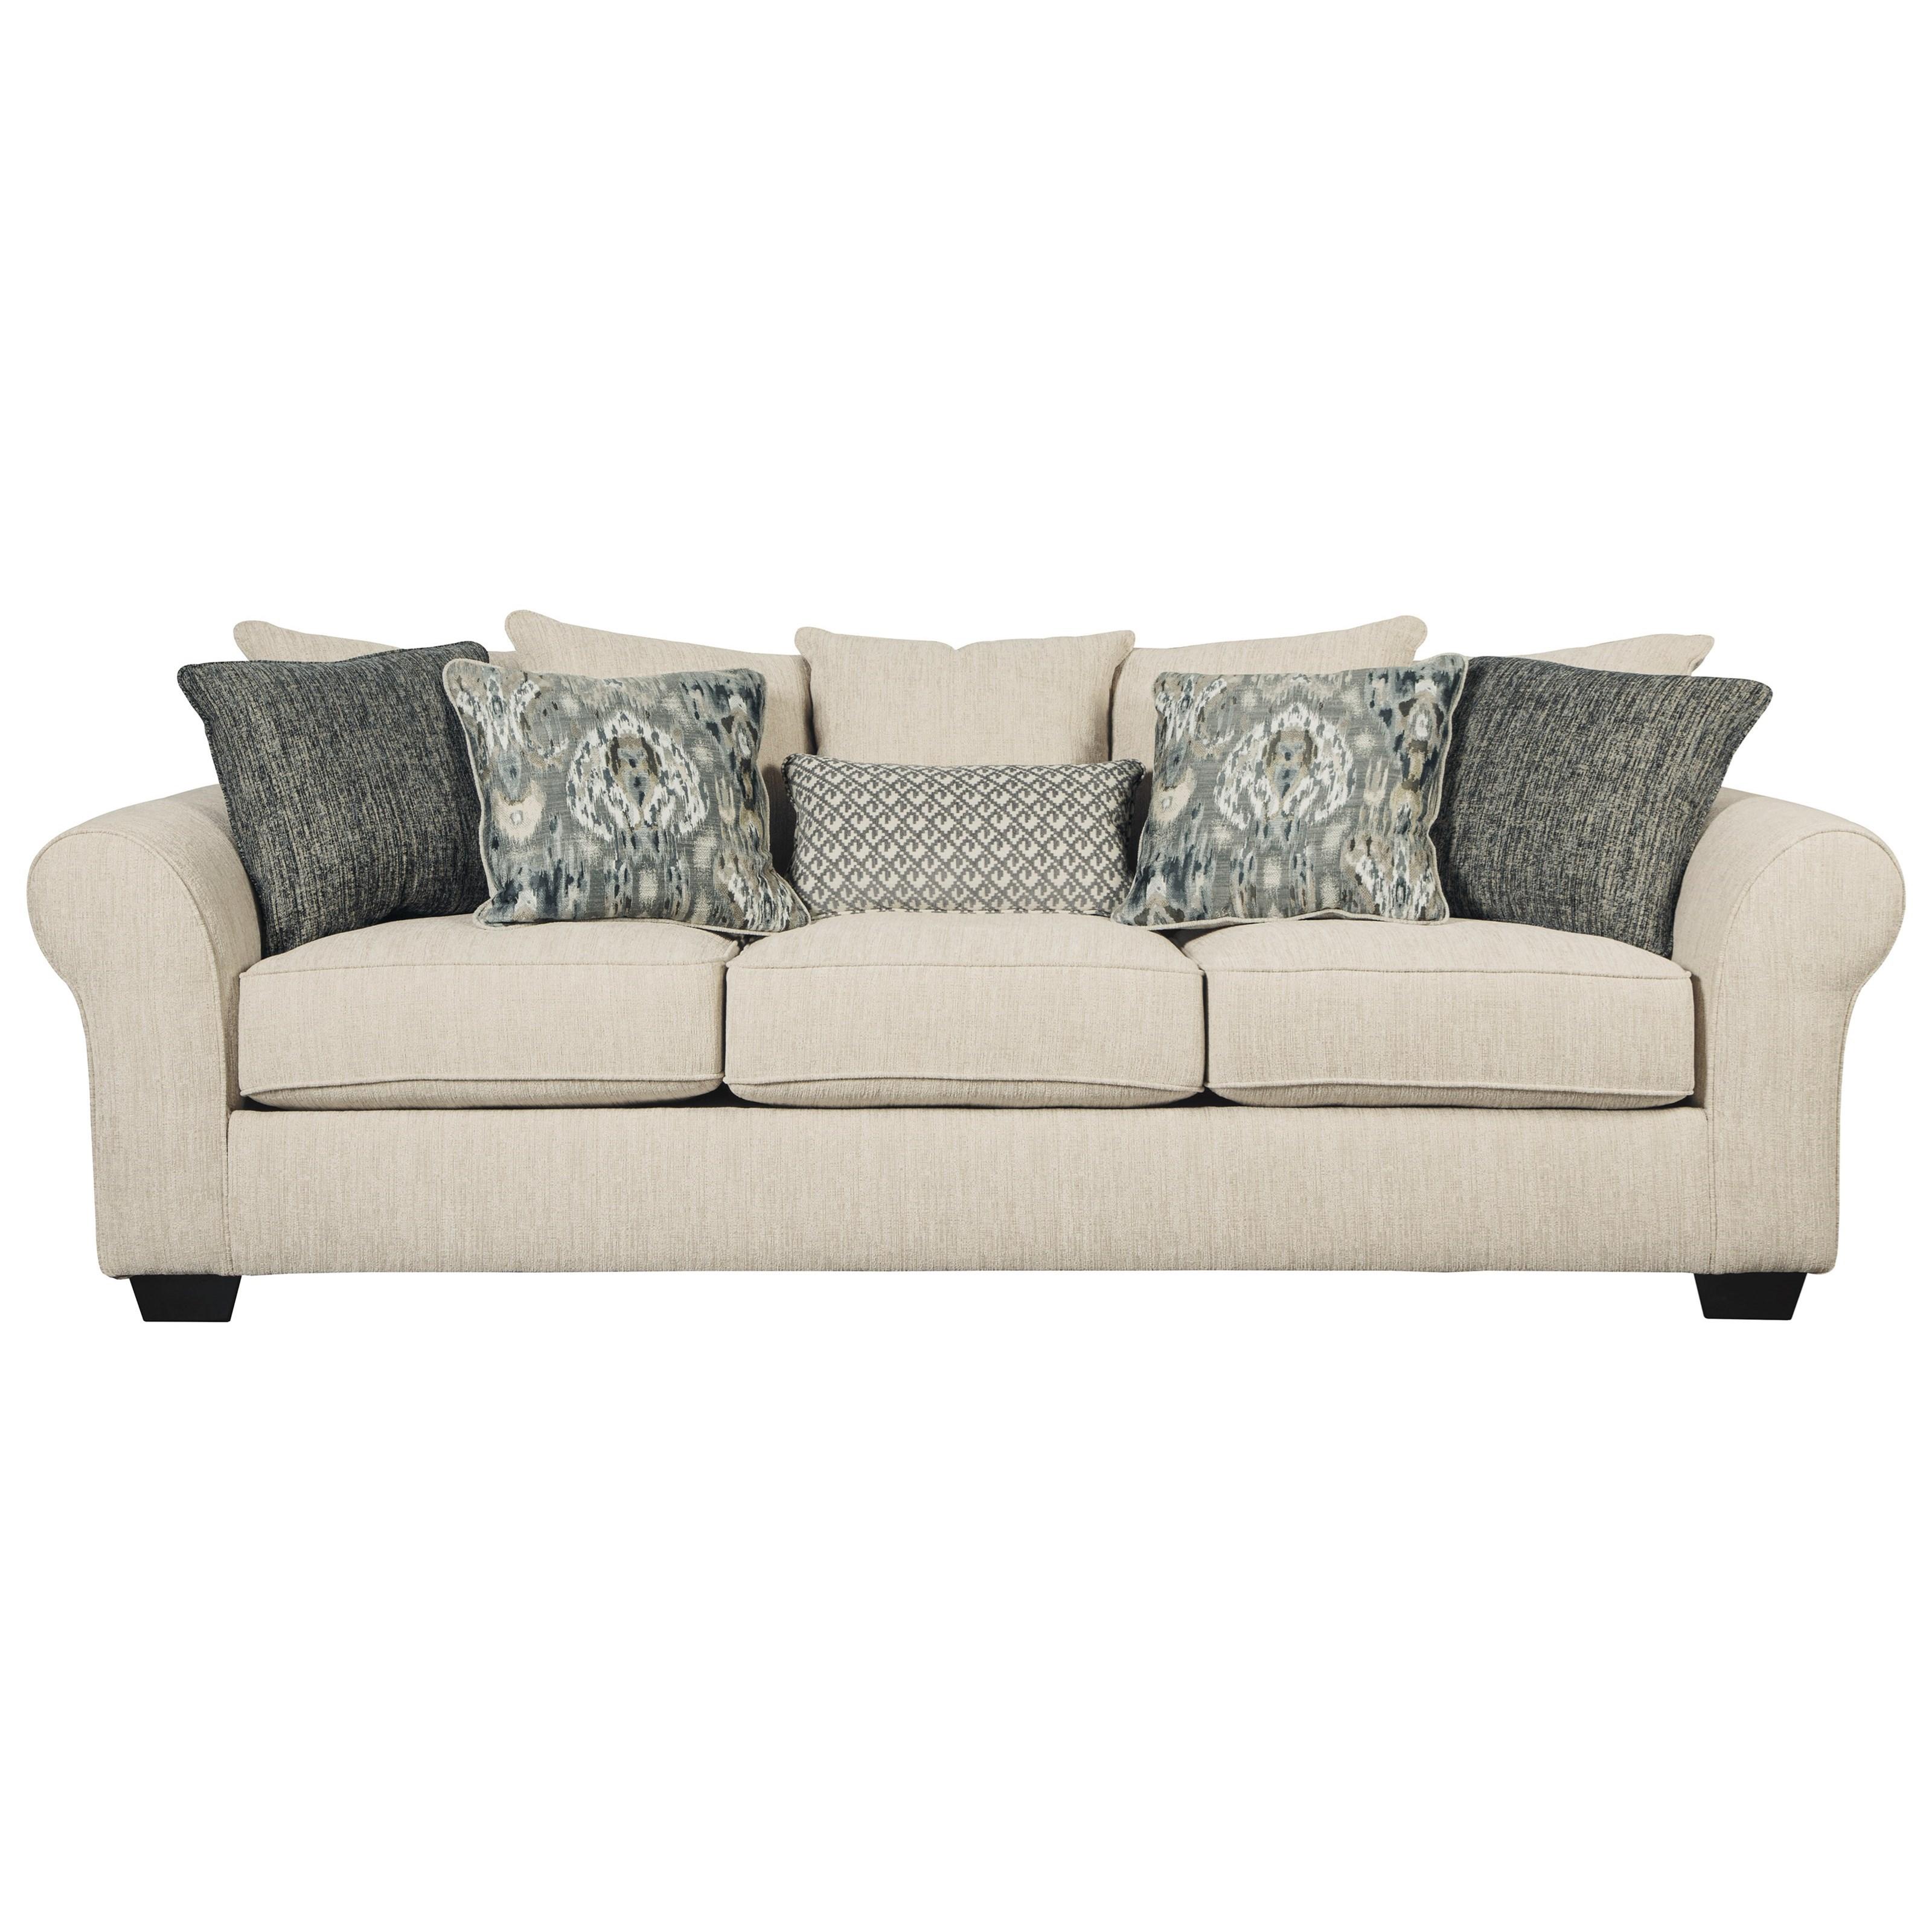 Ashley Silsbee Sofa - Item Number: 5540238